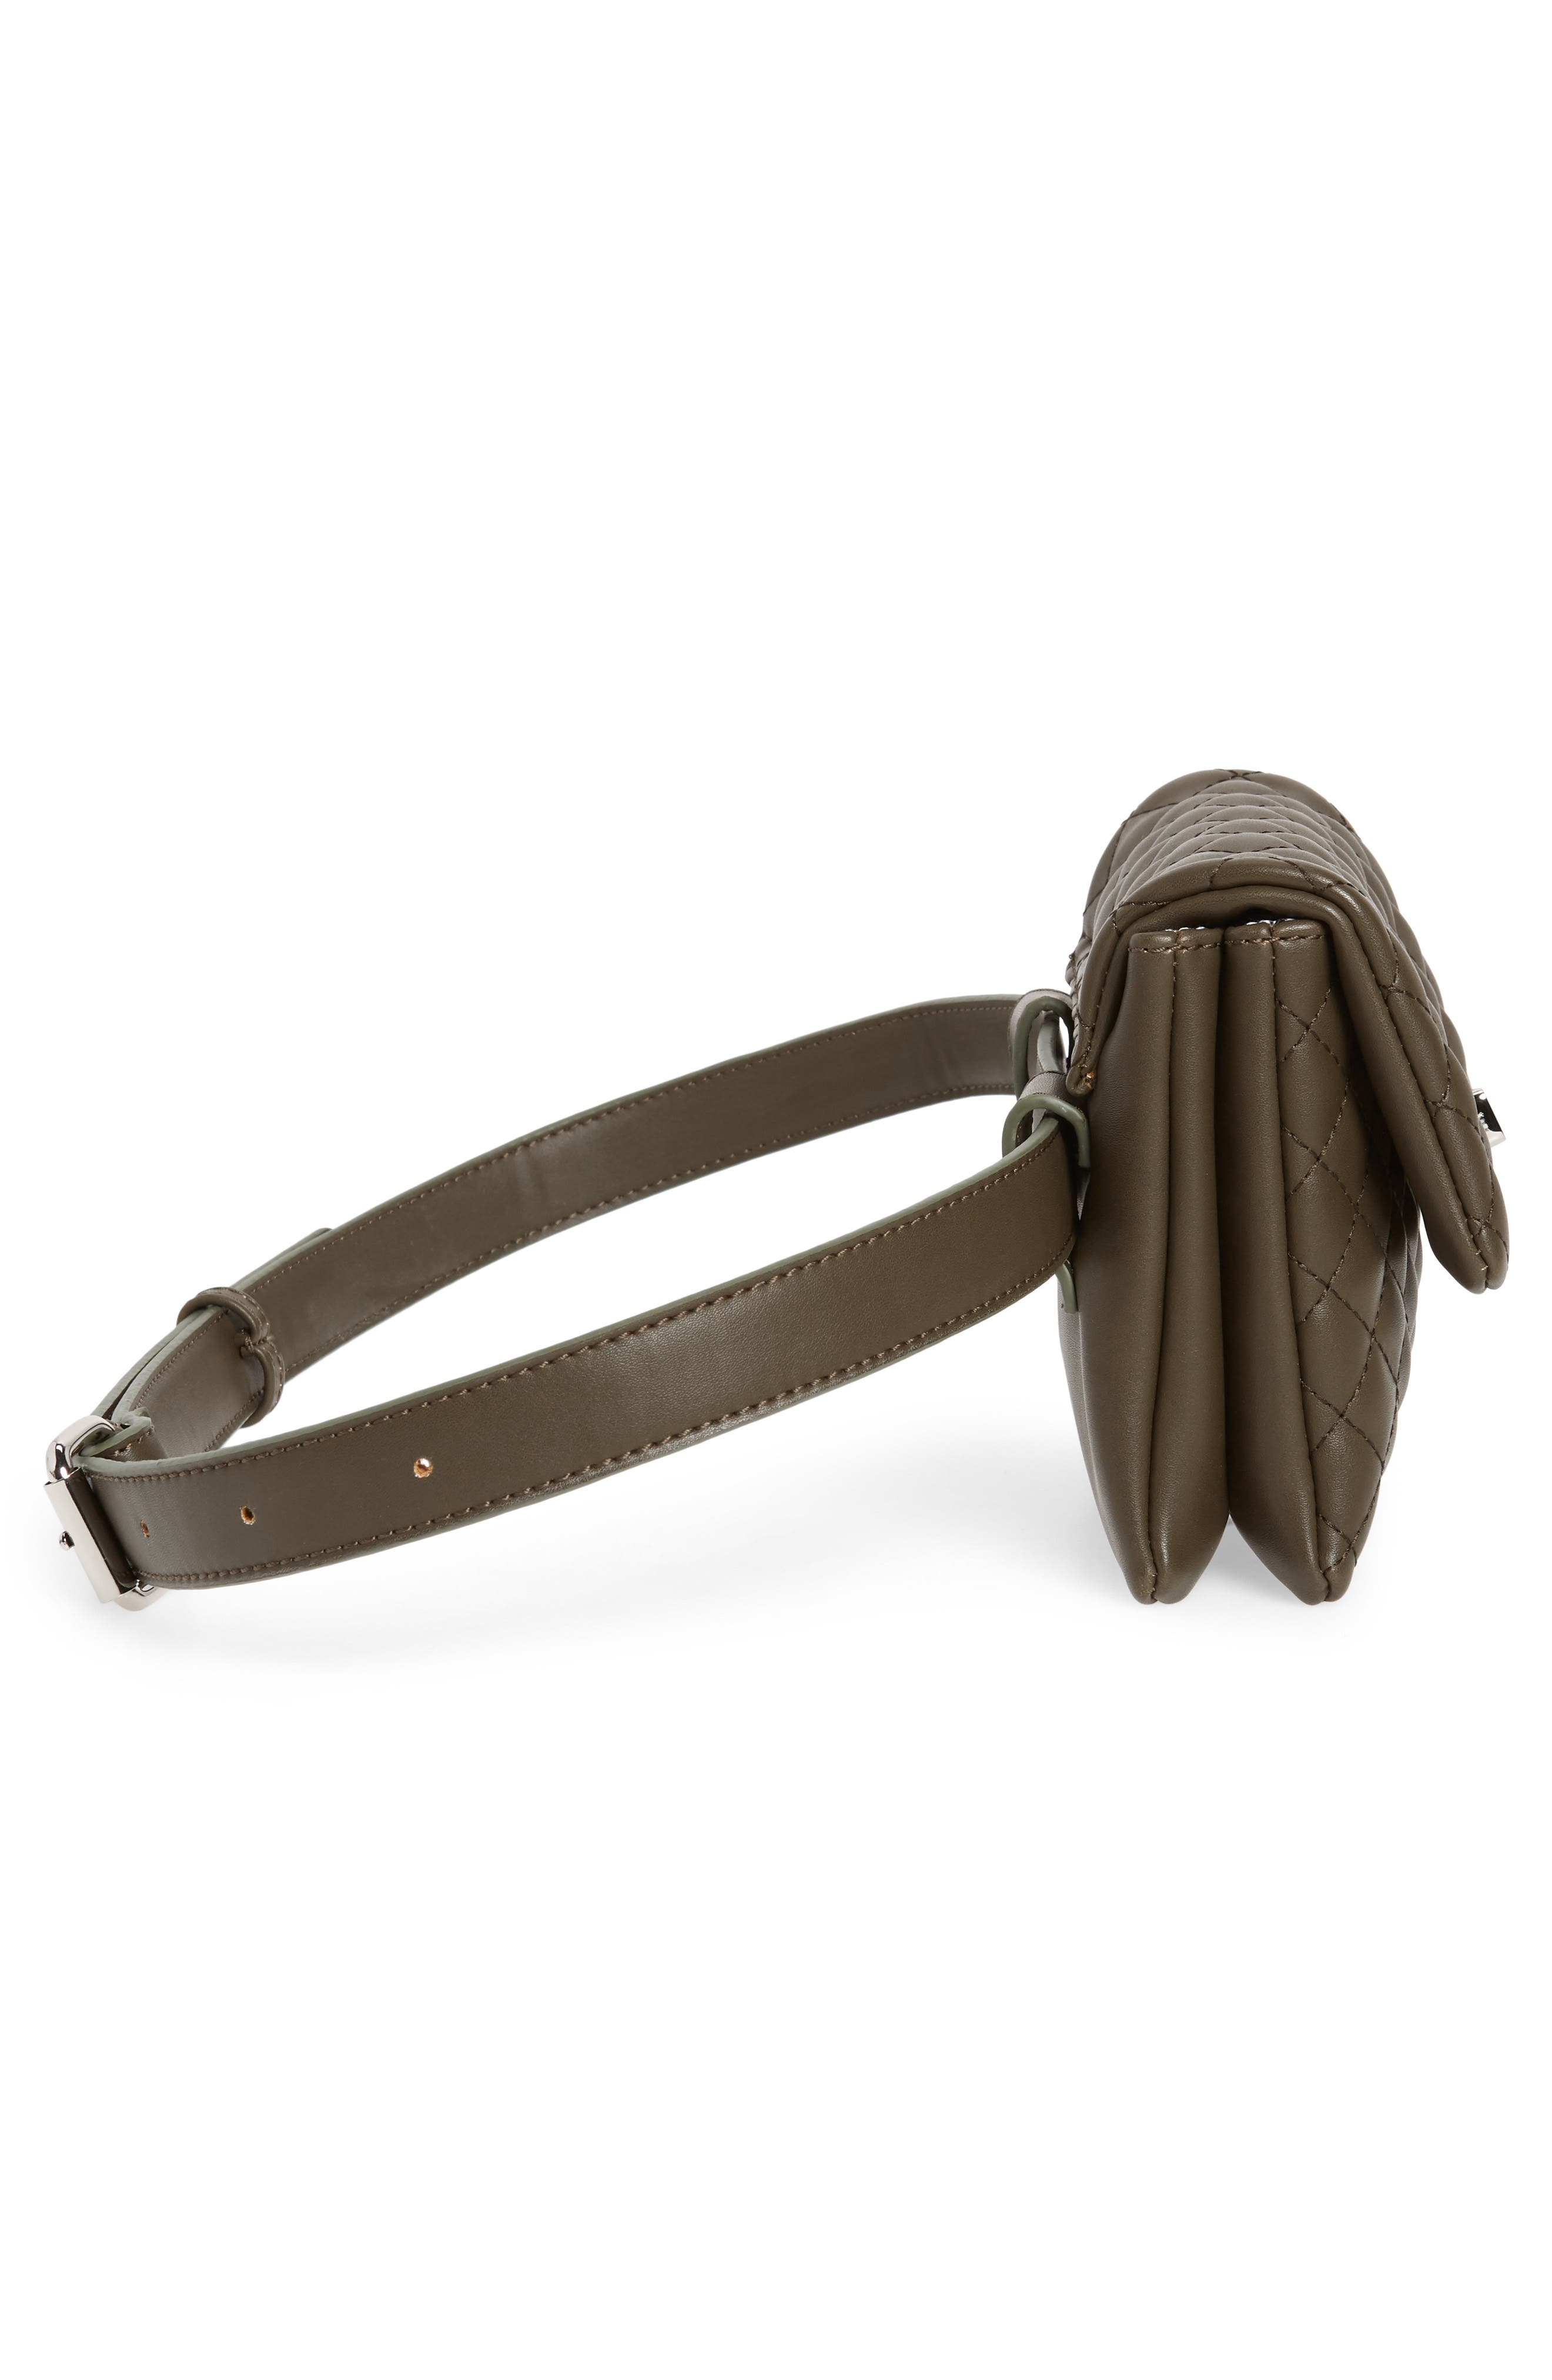 Mali + Lili Quilted Vegan Leather Convertible Belt Bag,                             Alternate thumbnail 7, color,                             OLIVE